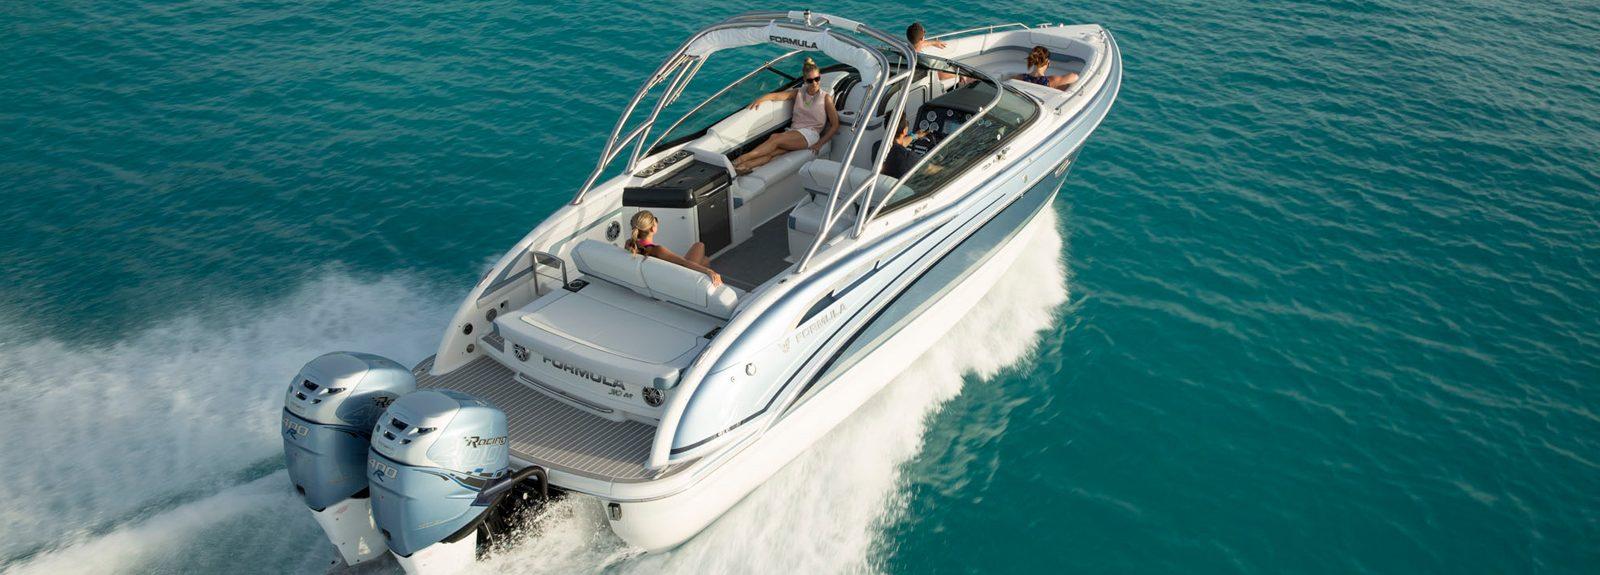 Tekneler :BR310 bowrider tekne.jpg - tekne